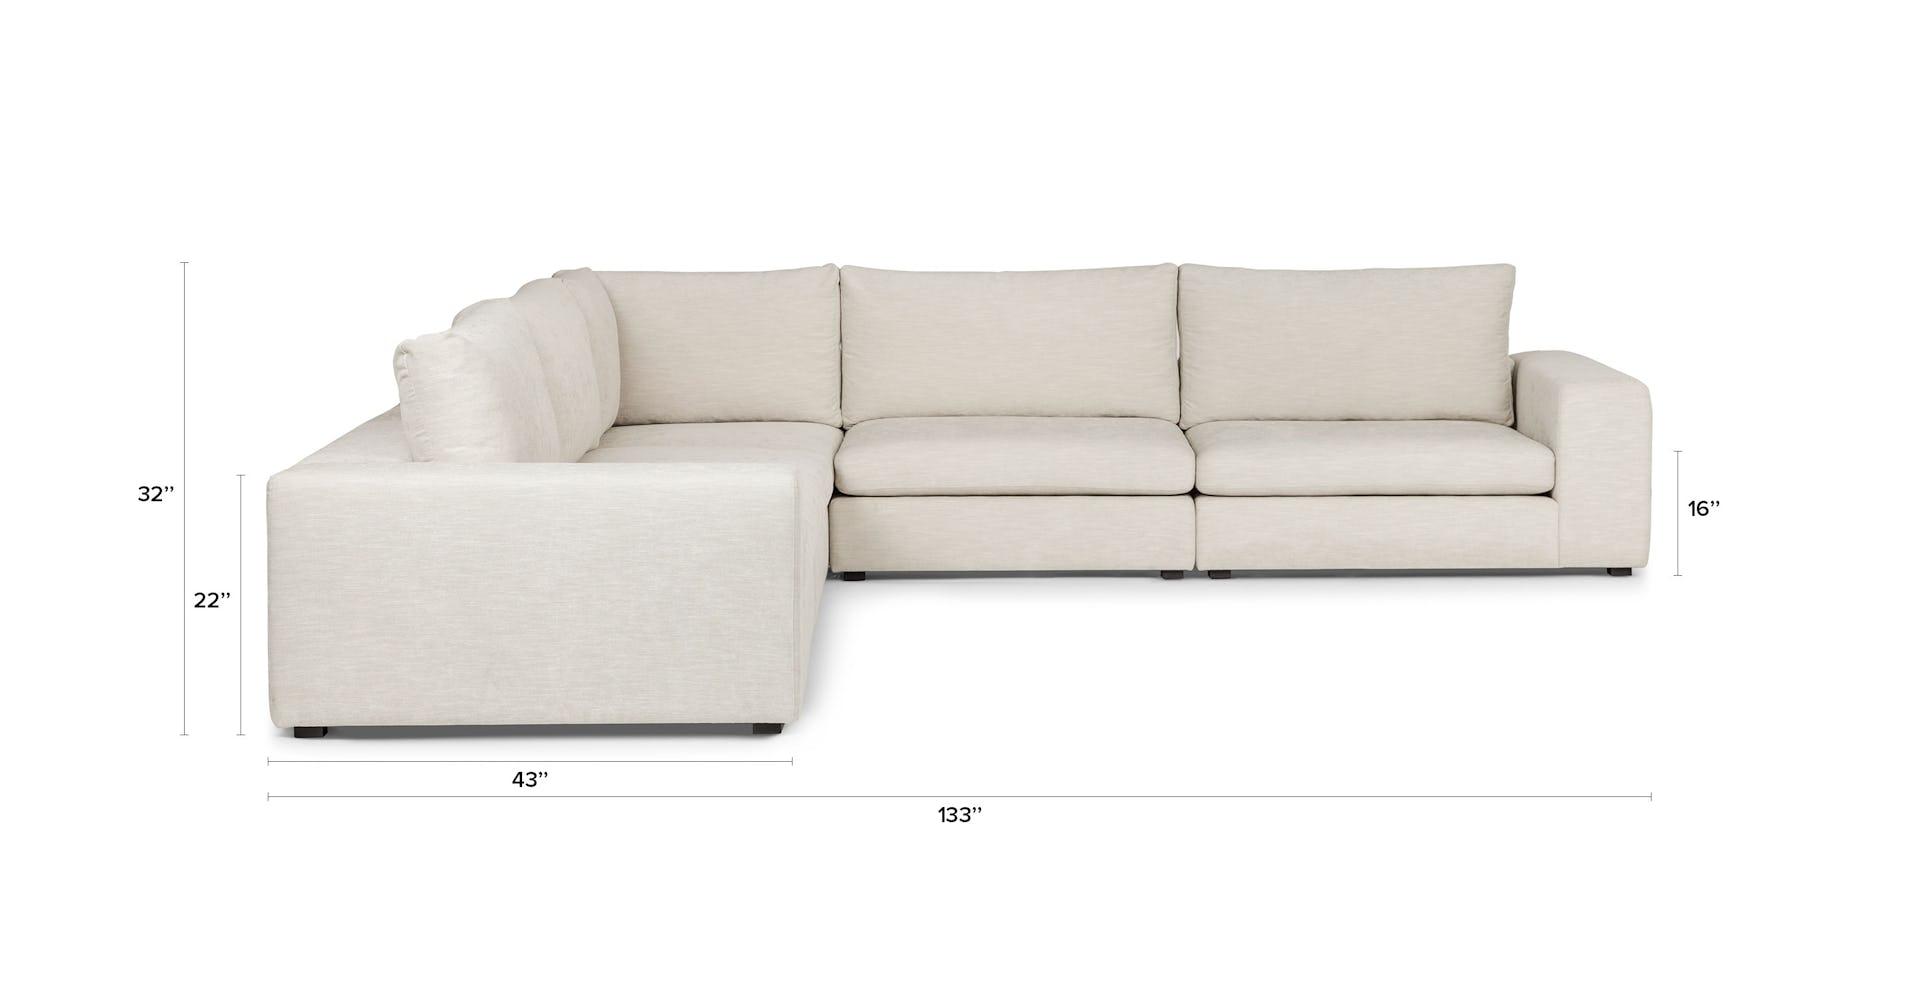 Gaba Pearl White Corner Modular Sectional